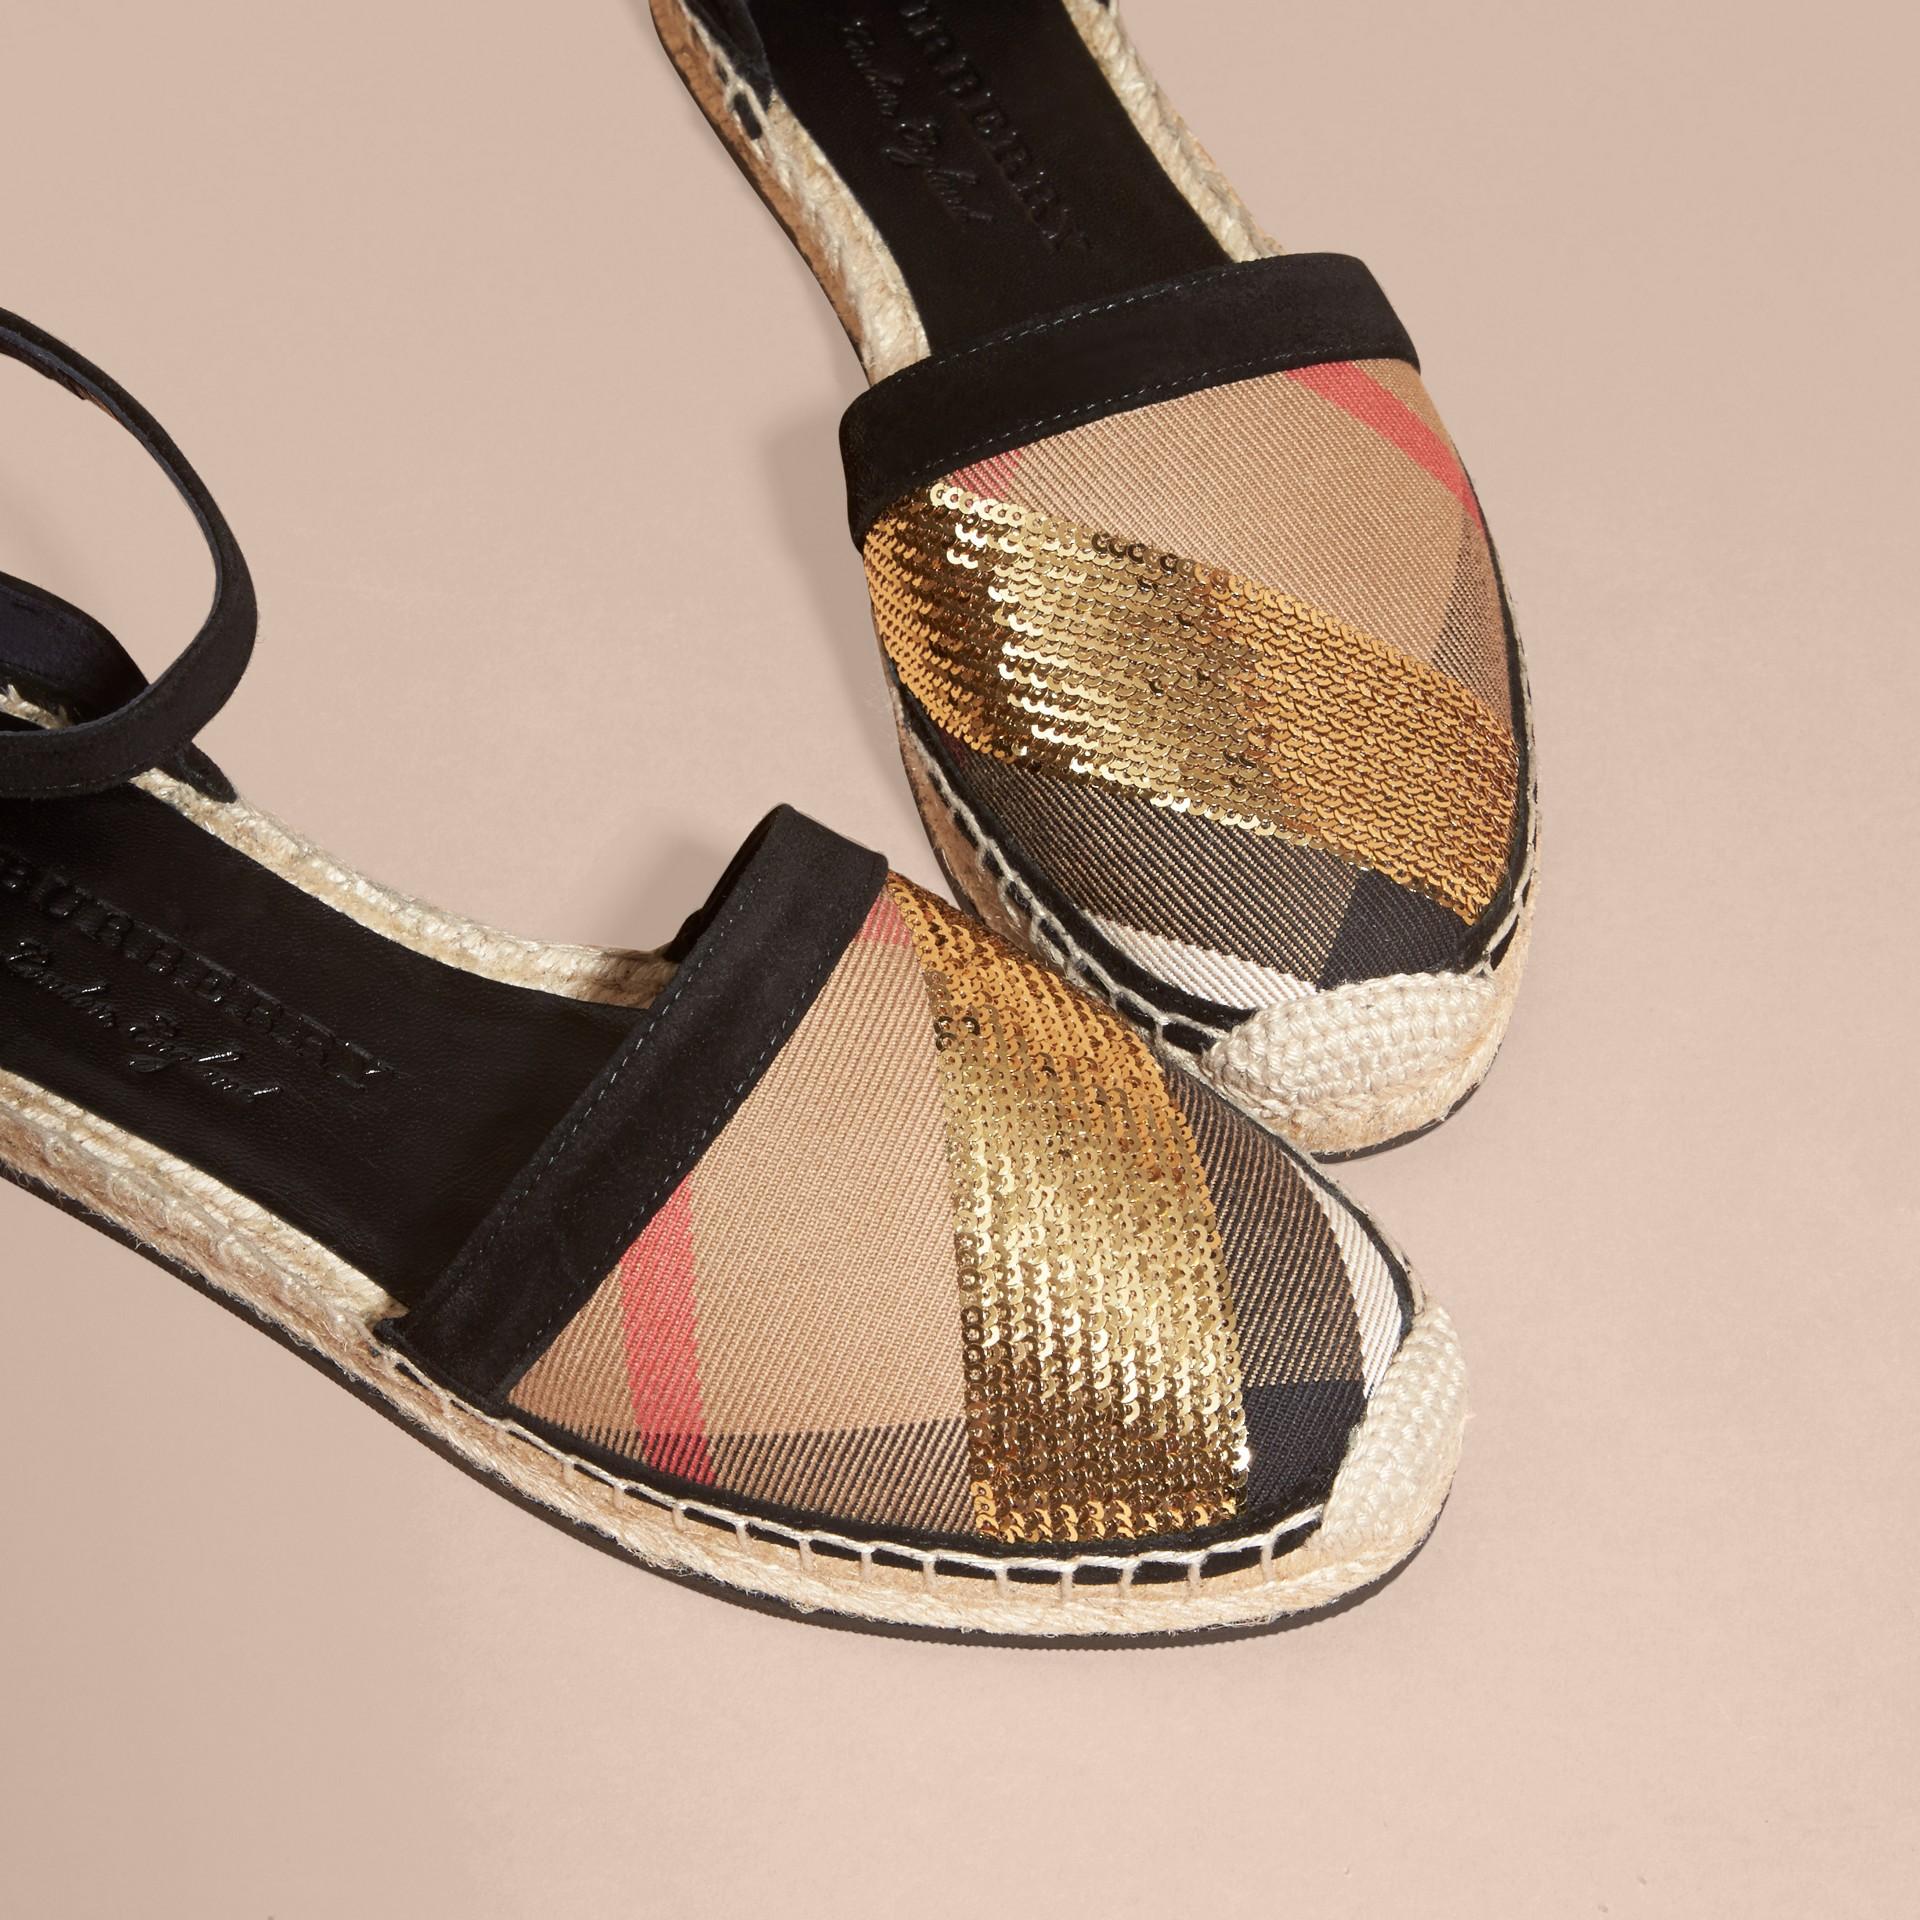 House 格紋/金色 亮片皮革拼 House 格紋麻織涼鞋 格紋/金色 - 圖庫照片 6